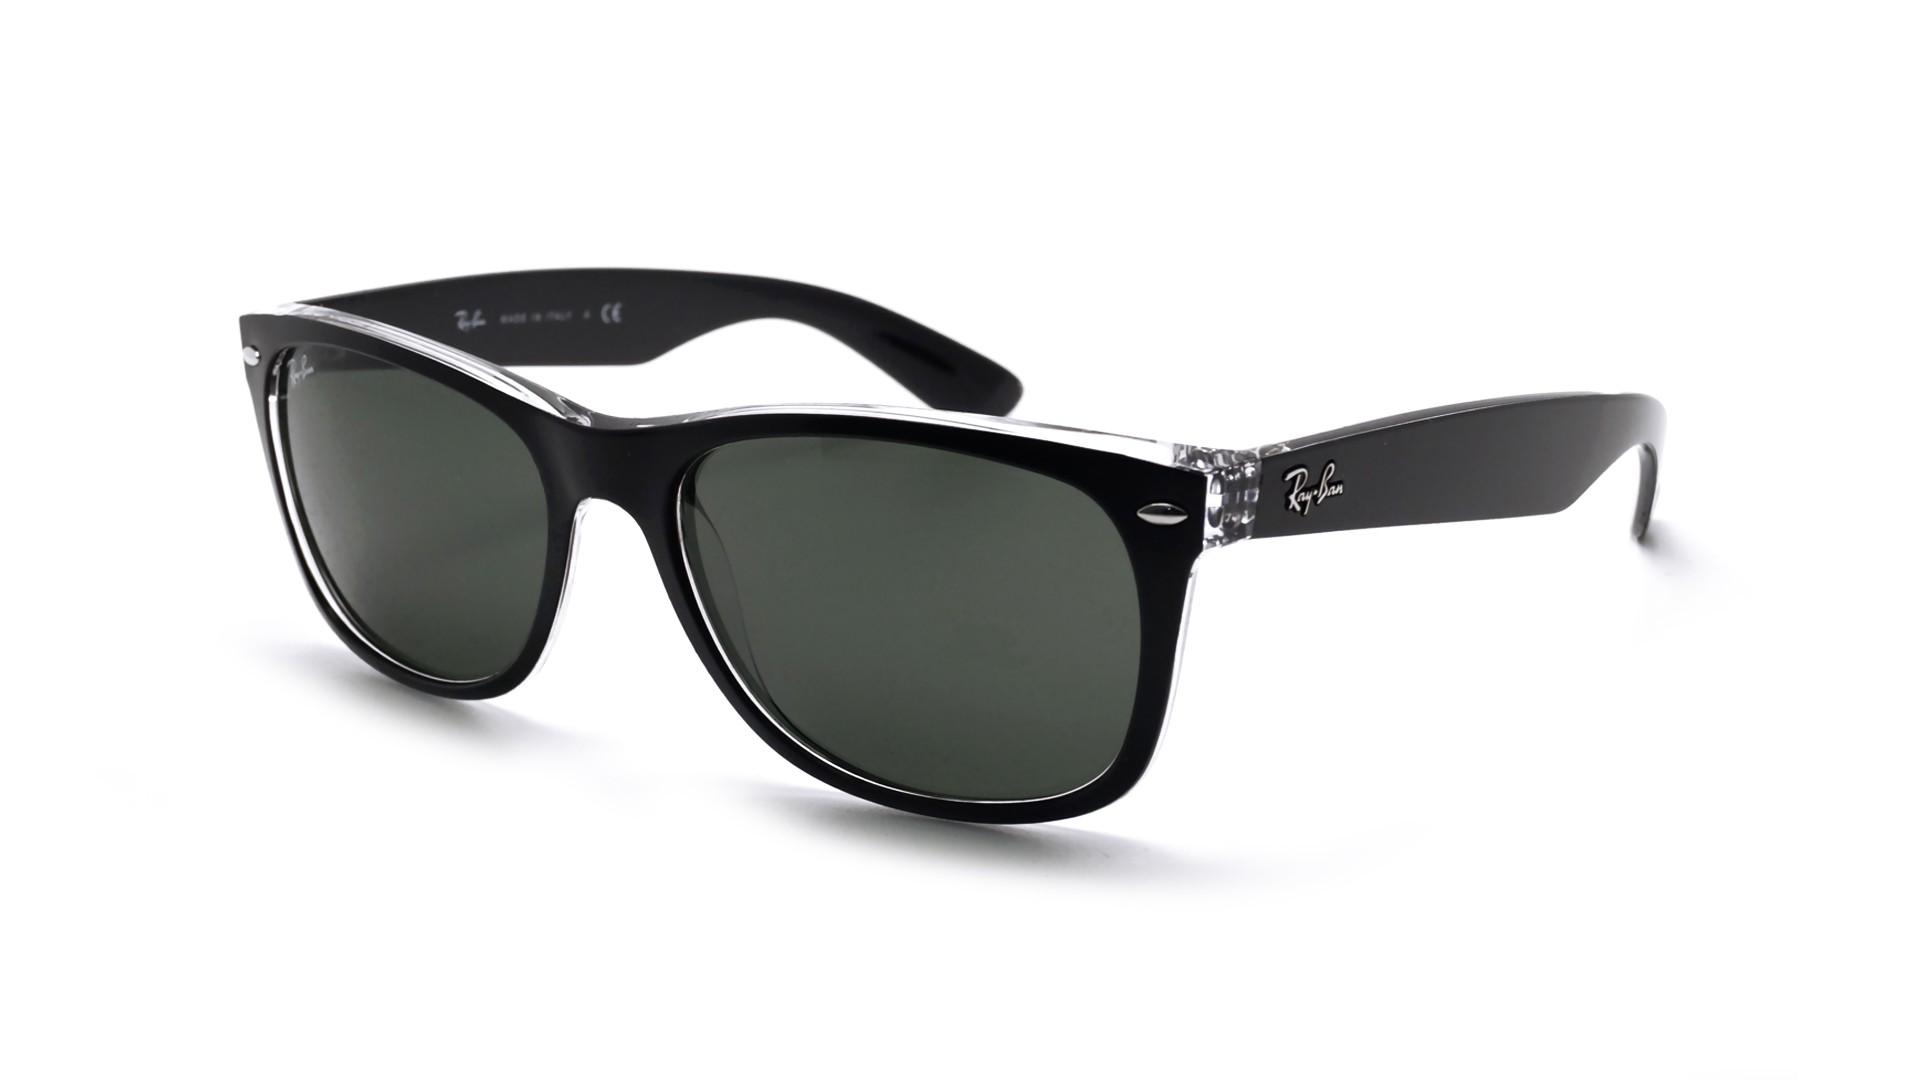 39895985e0d Sunglasses Ray-Ban New Wayfarer Black Matte G-15 RB2132 6052 58-18 Large